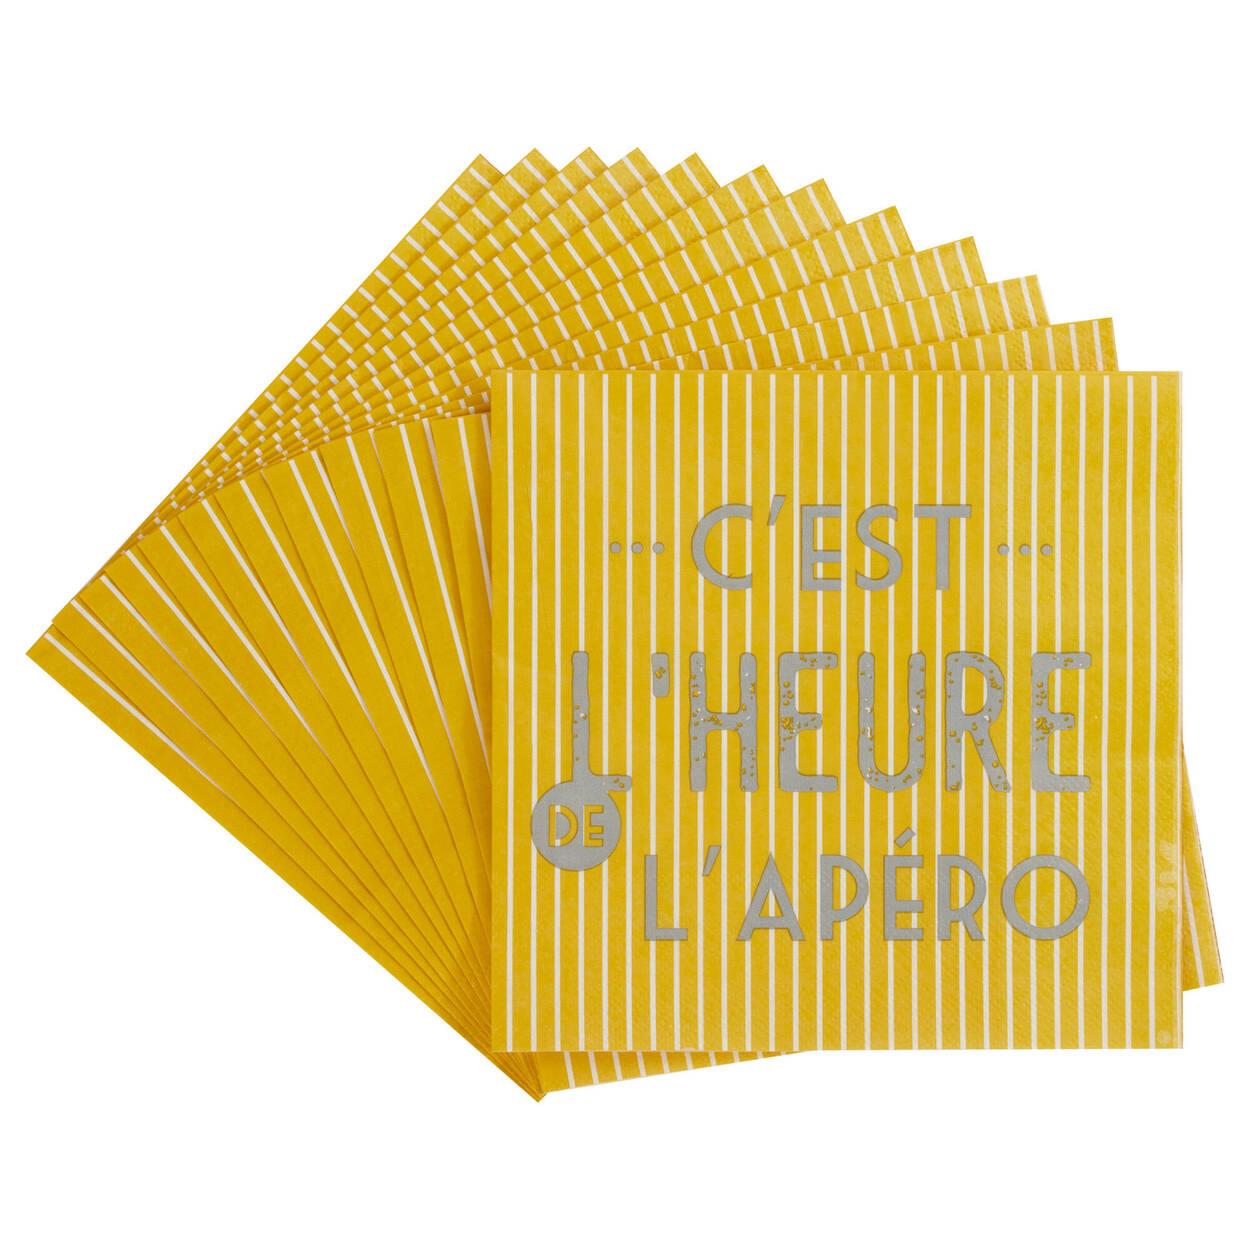 Pack of 20 Apéro Paper Napkins